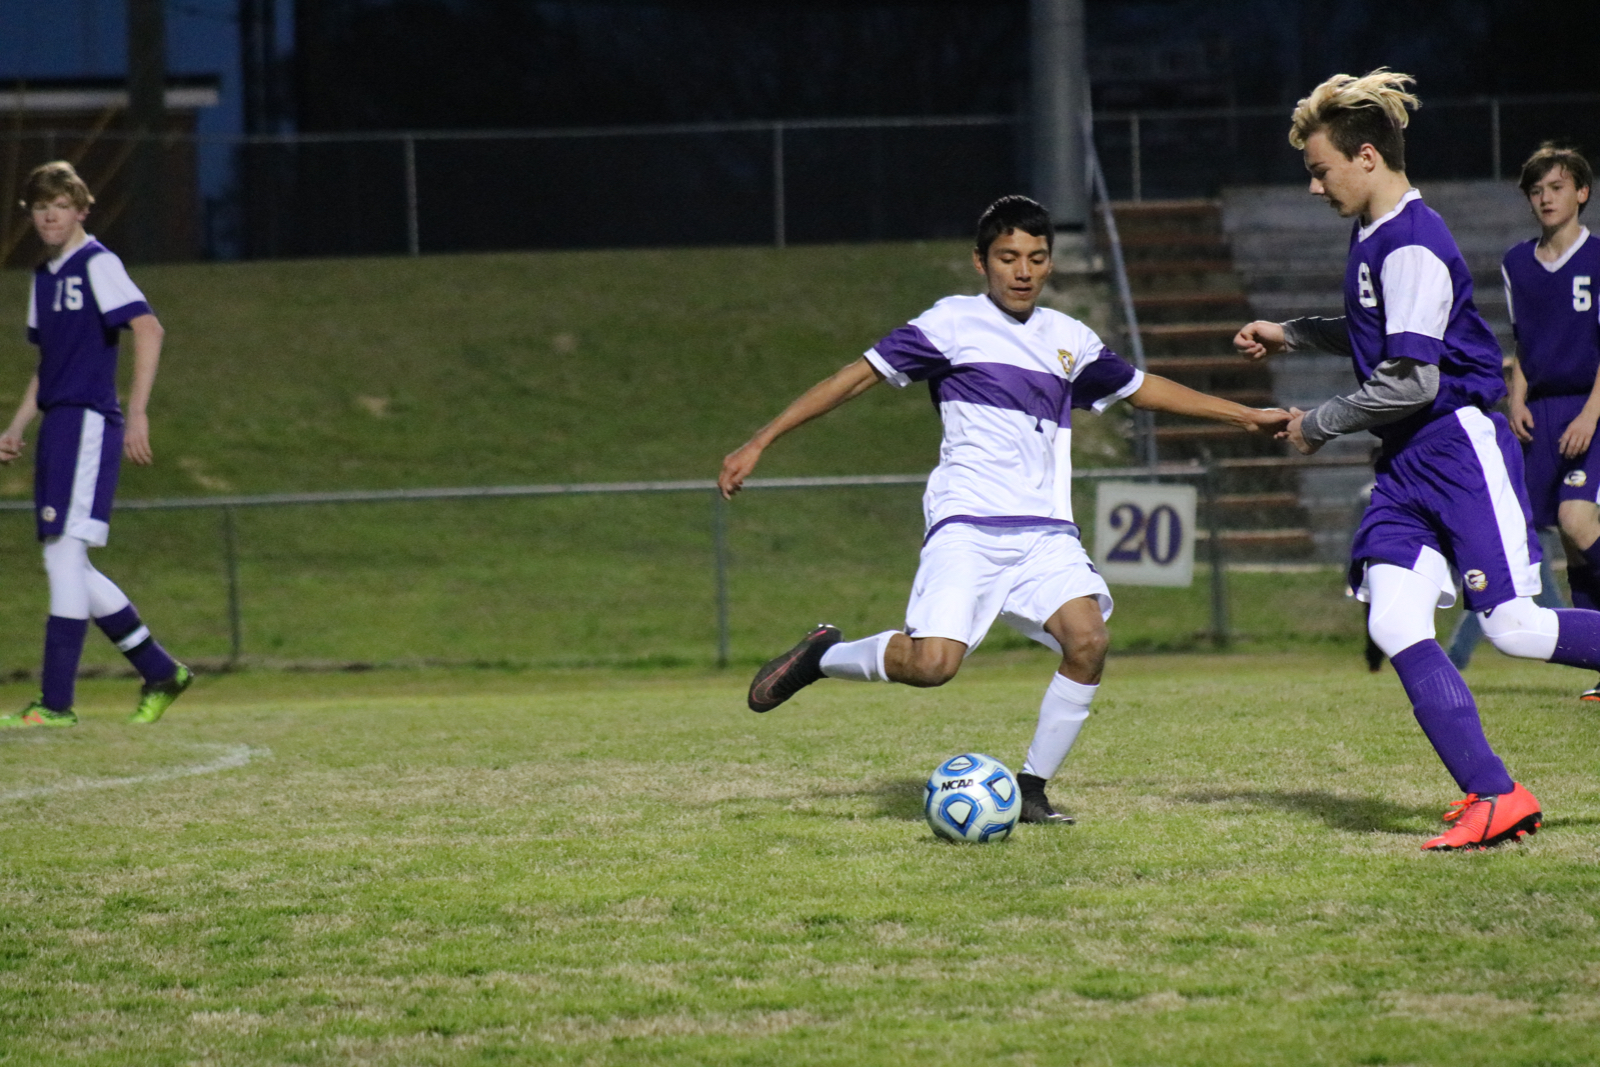 PCHS soccer team wins inaugural game over Goshen 4-3